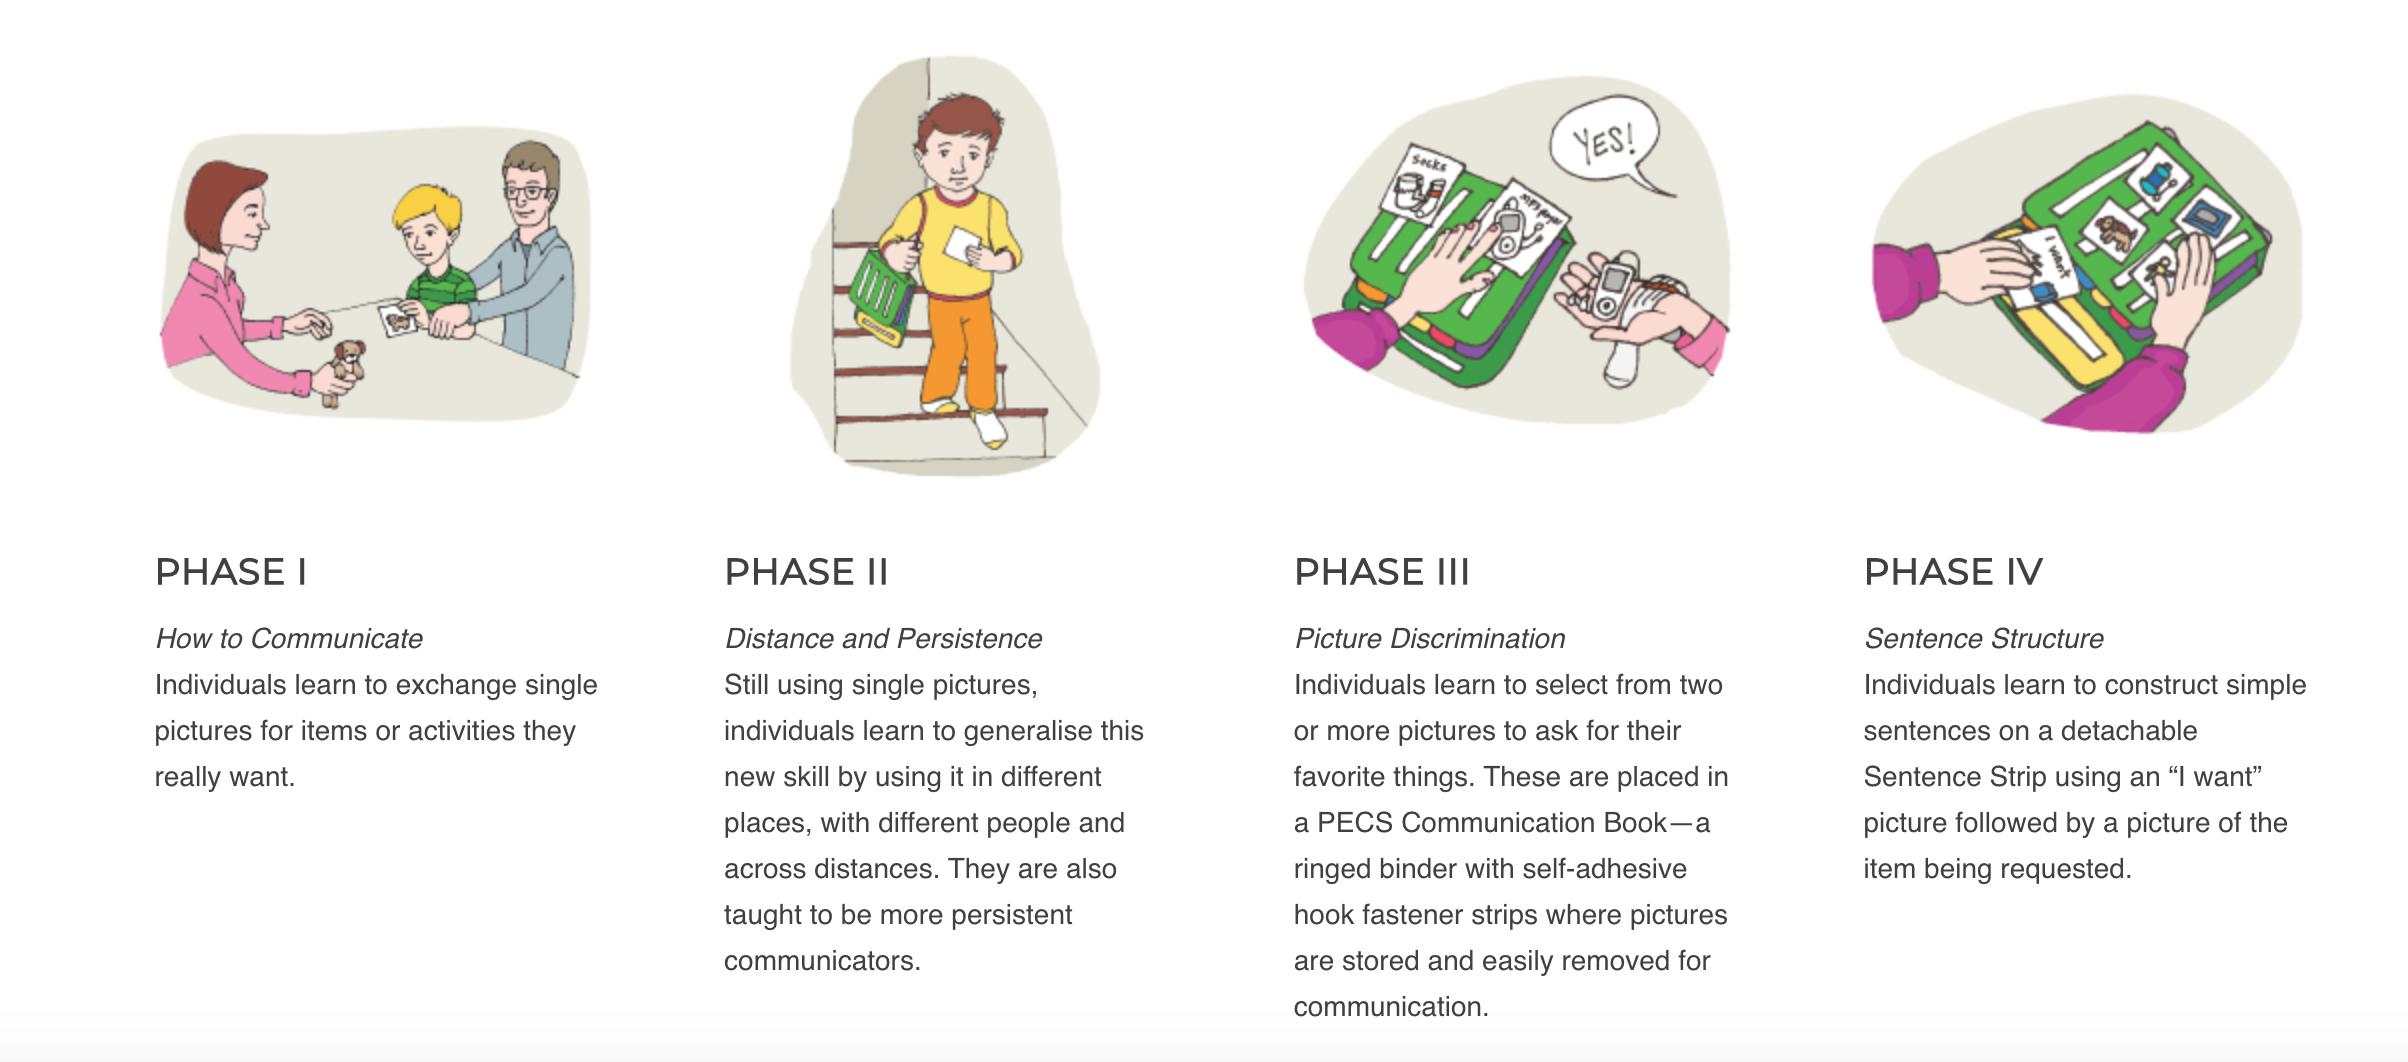 phases of PECS